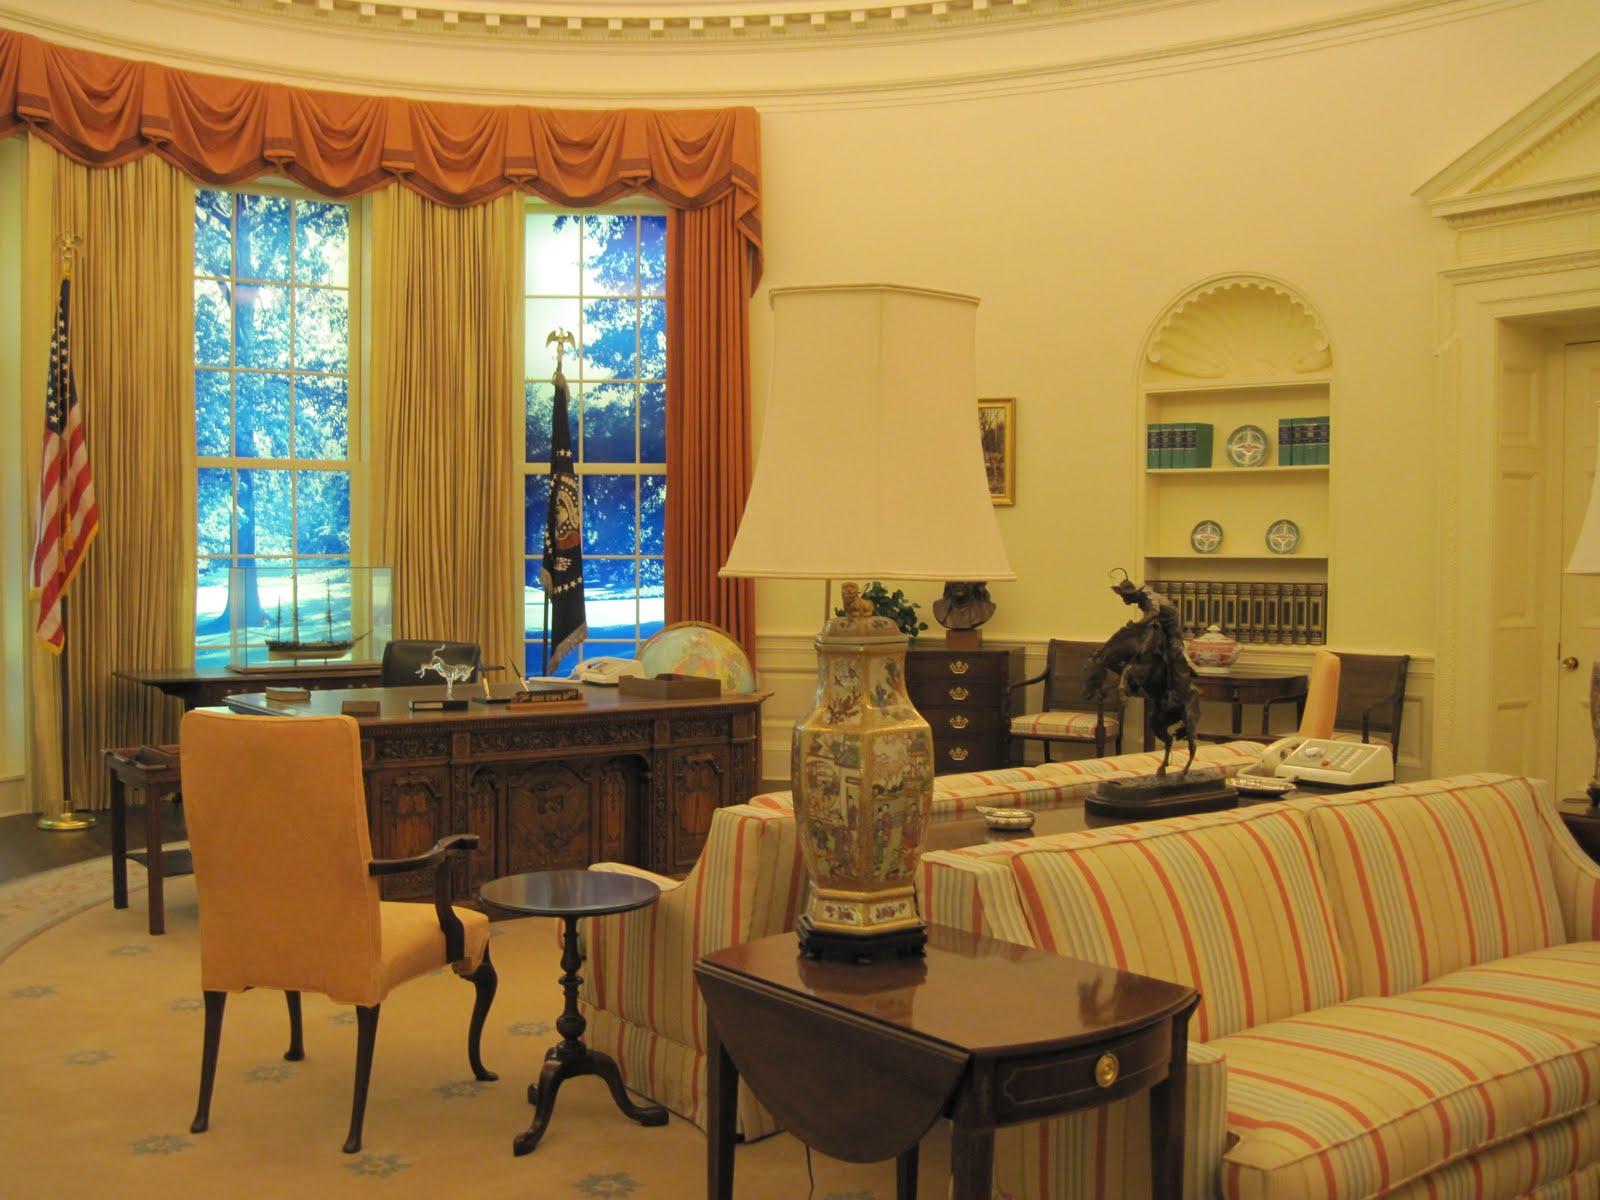 Edandsherill: The oval office of Jimmy Carter